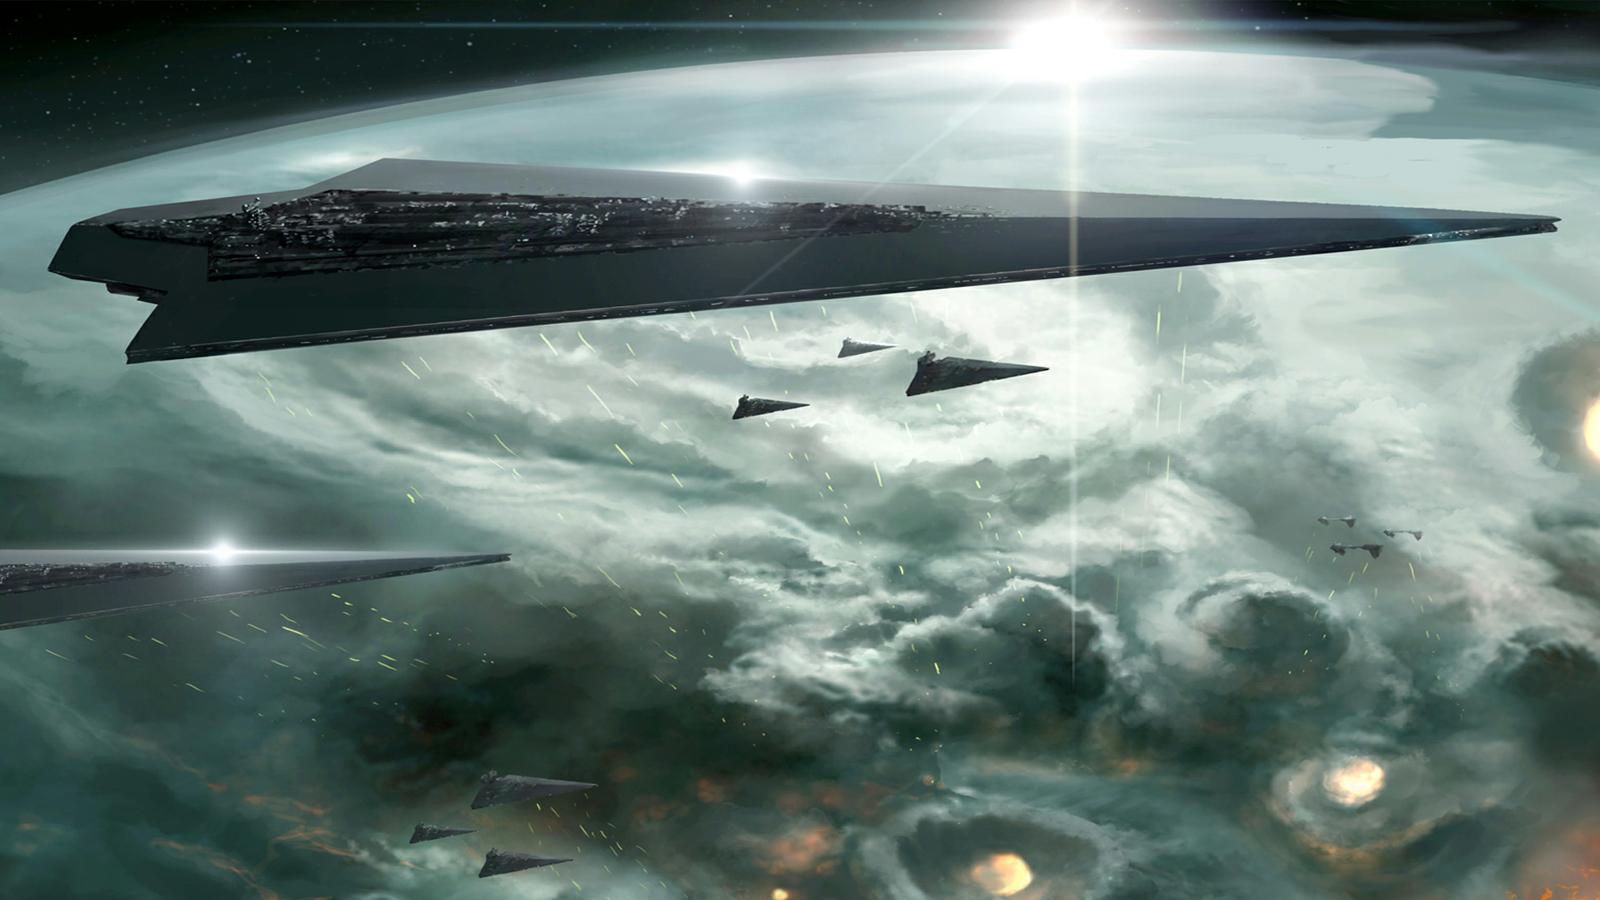 star wars empire wallpaper hd - photo #15